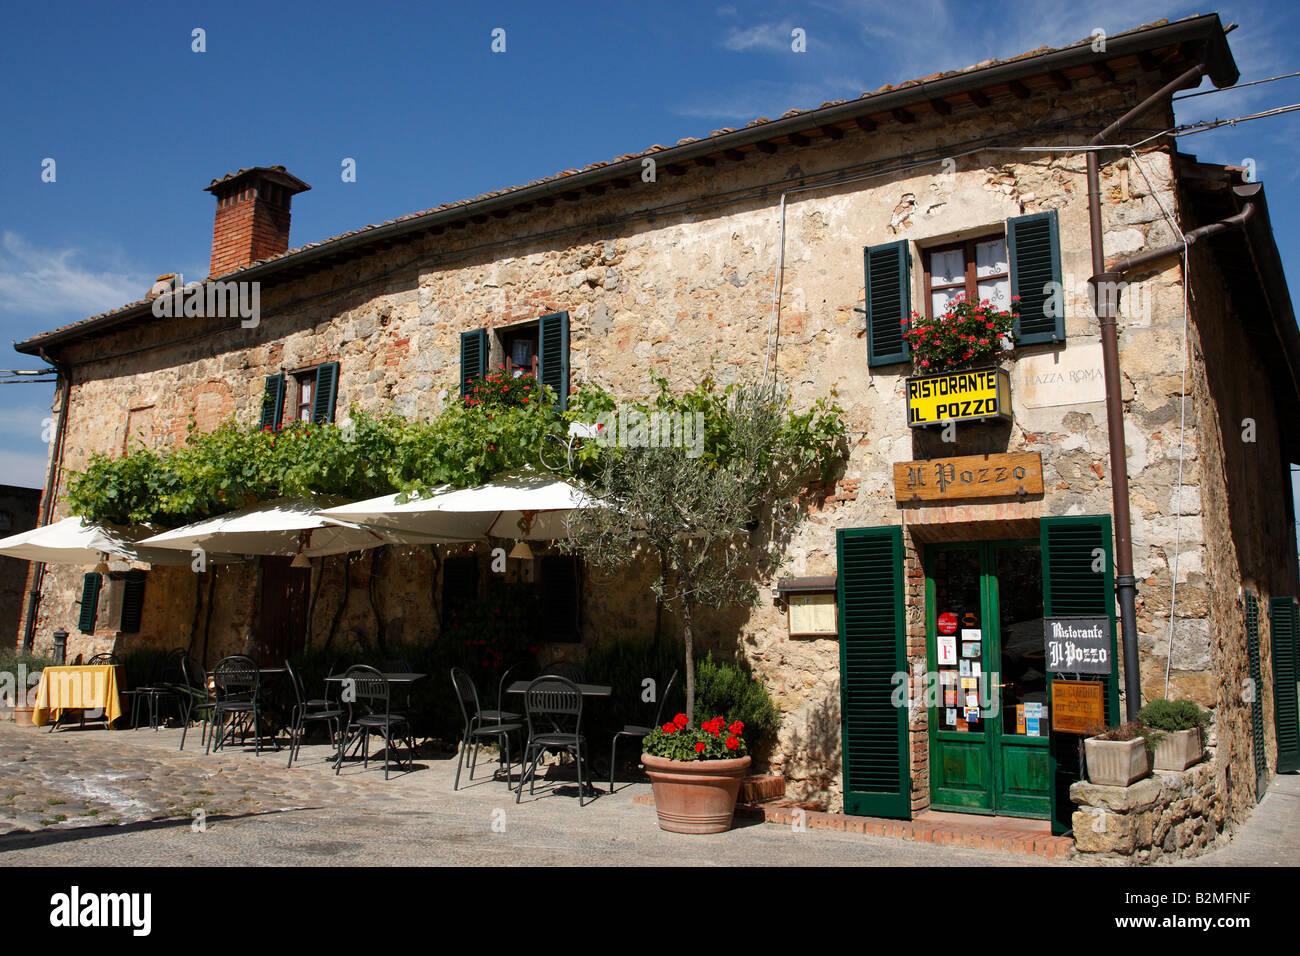 https://c8.alamy.com/comp/B2MFNF/view-of-the-restaurant-il-pozzo-piazza-roma-monteriggioni-tuscany-B2MFNF.jpg